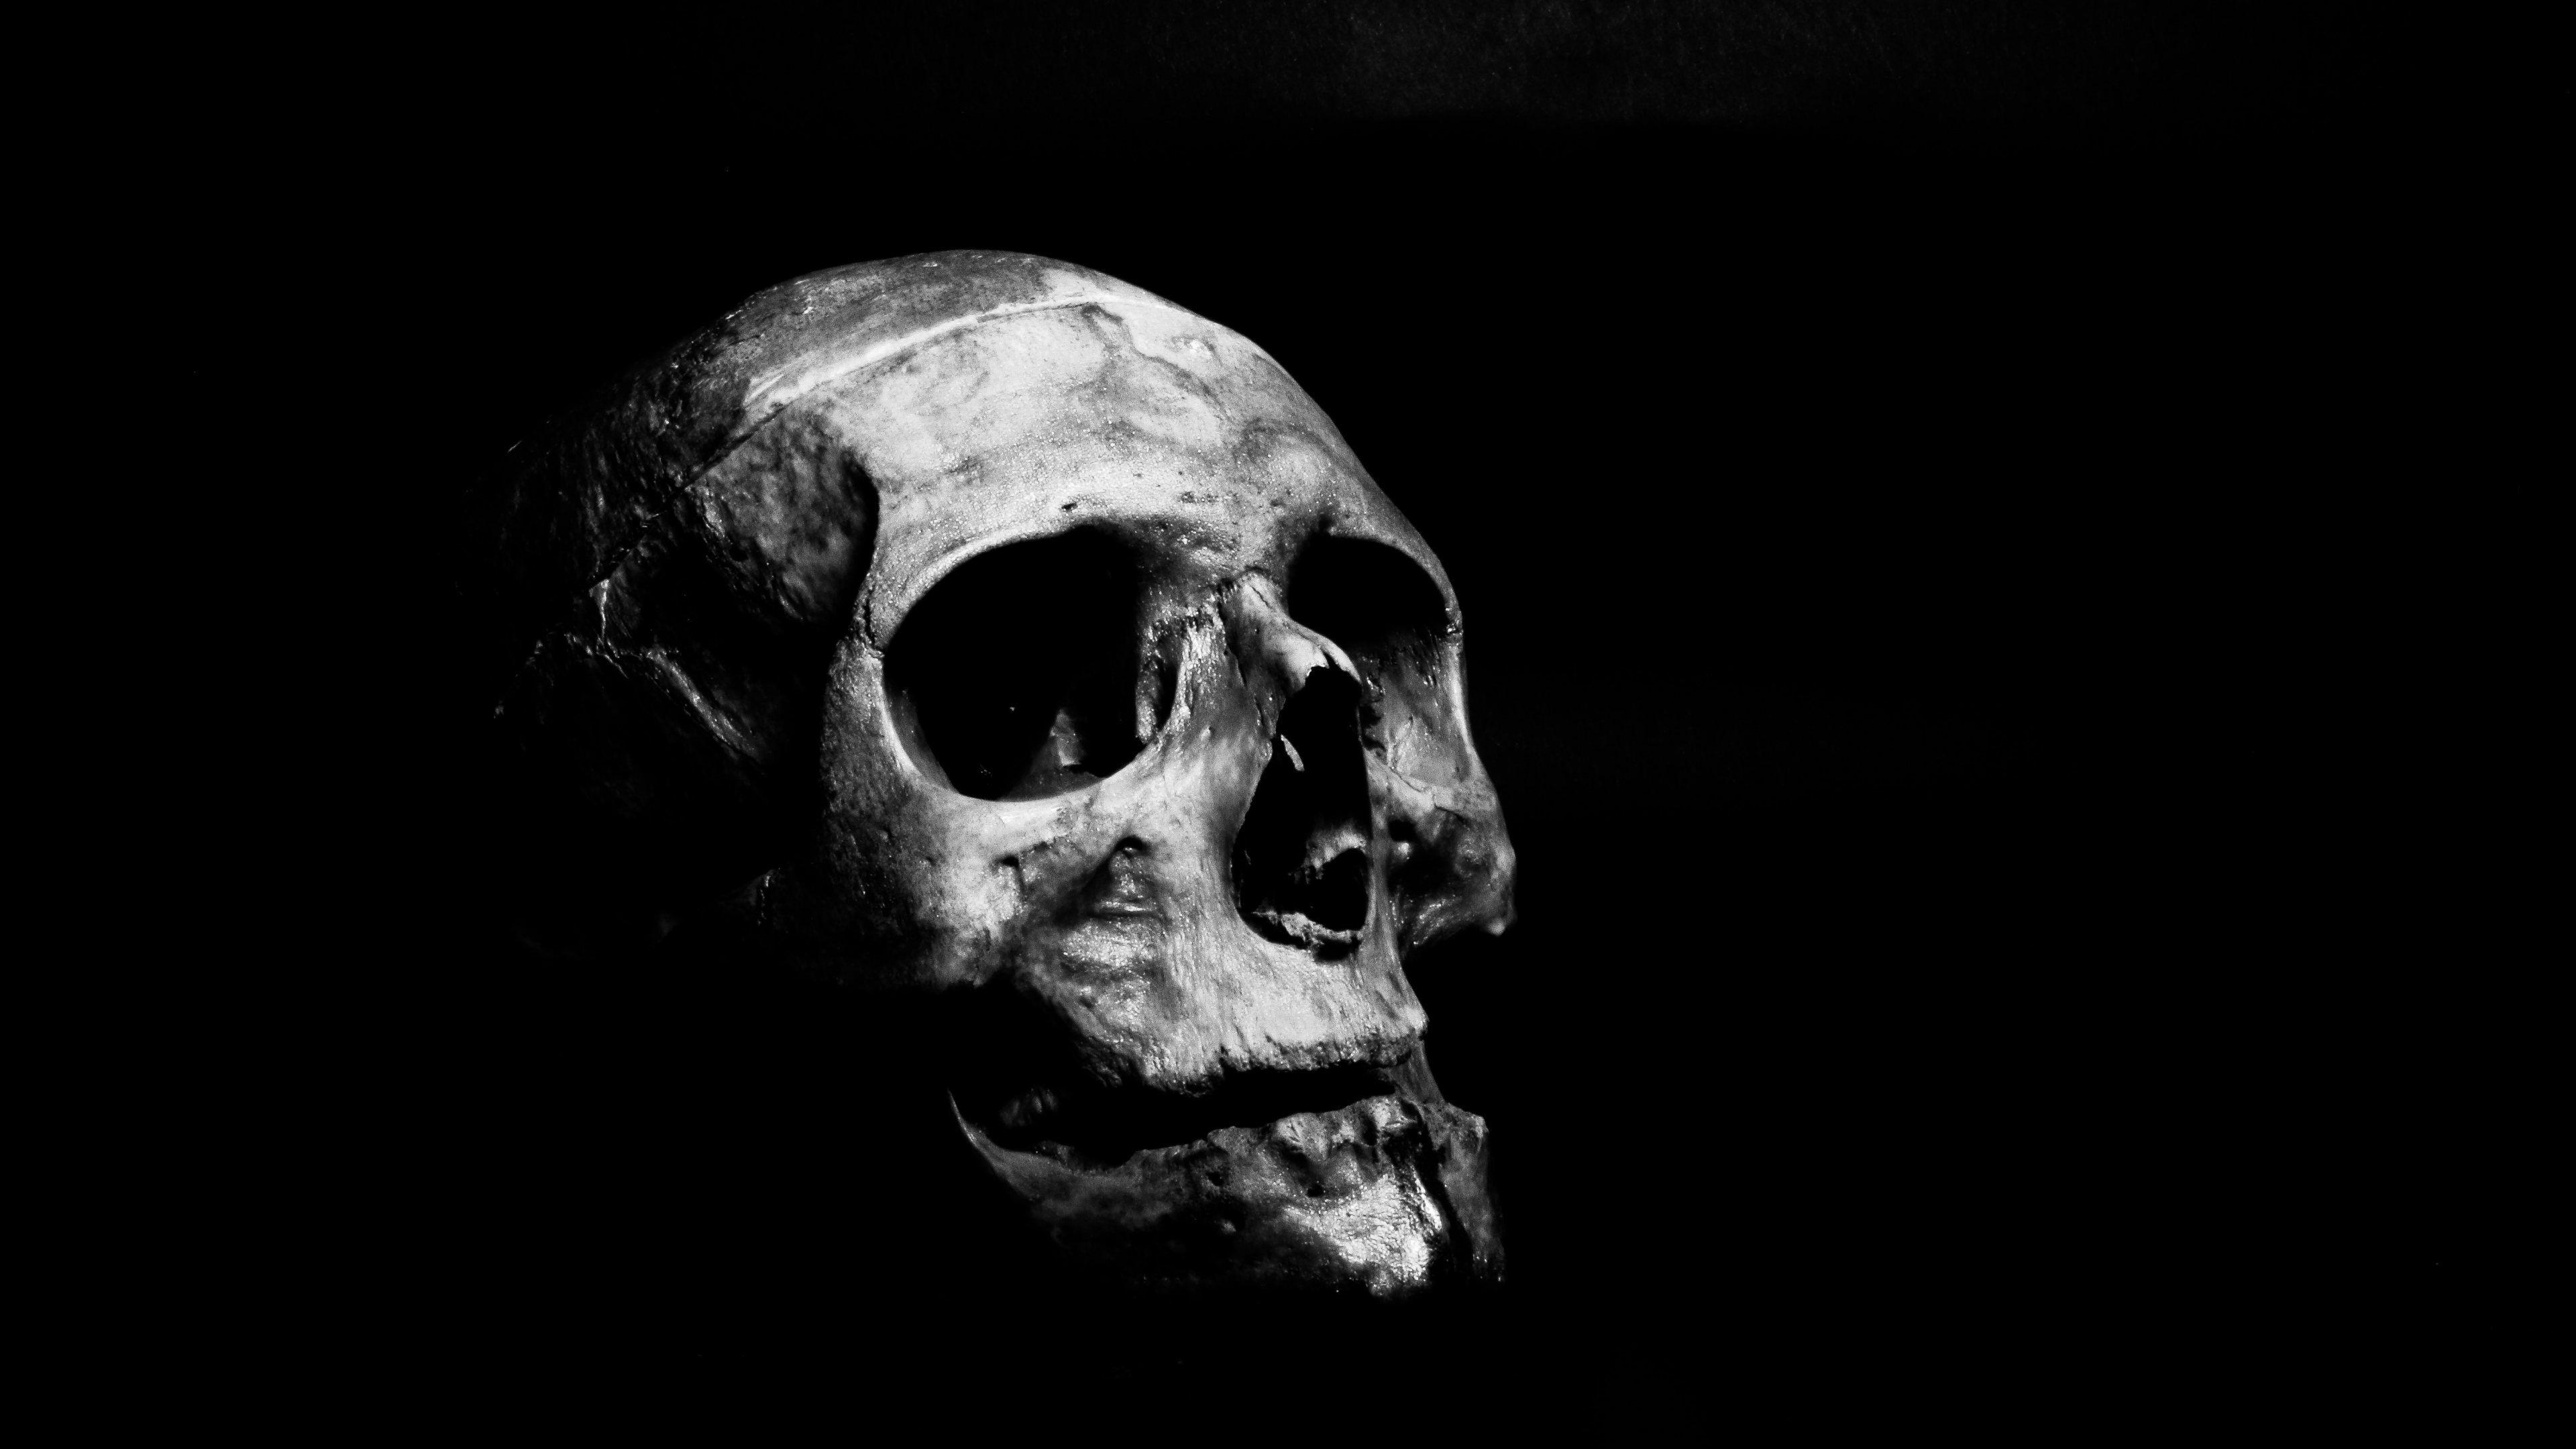 Skull By Ahmed Adly 3840x2160 4k In 2020 Dark Wallpaper Ios Wallpapers Black Wallpaper